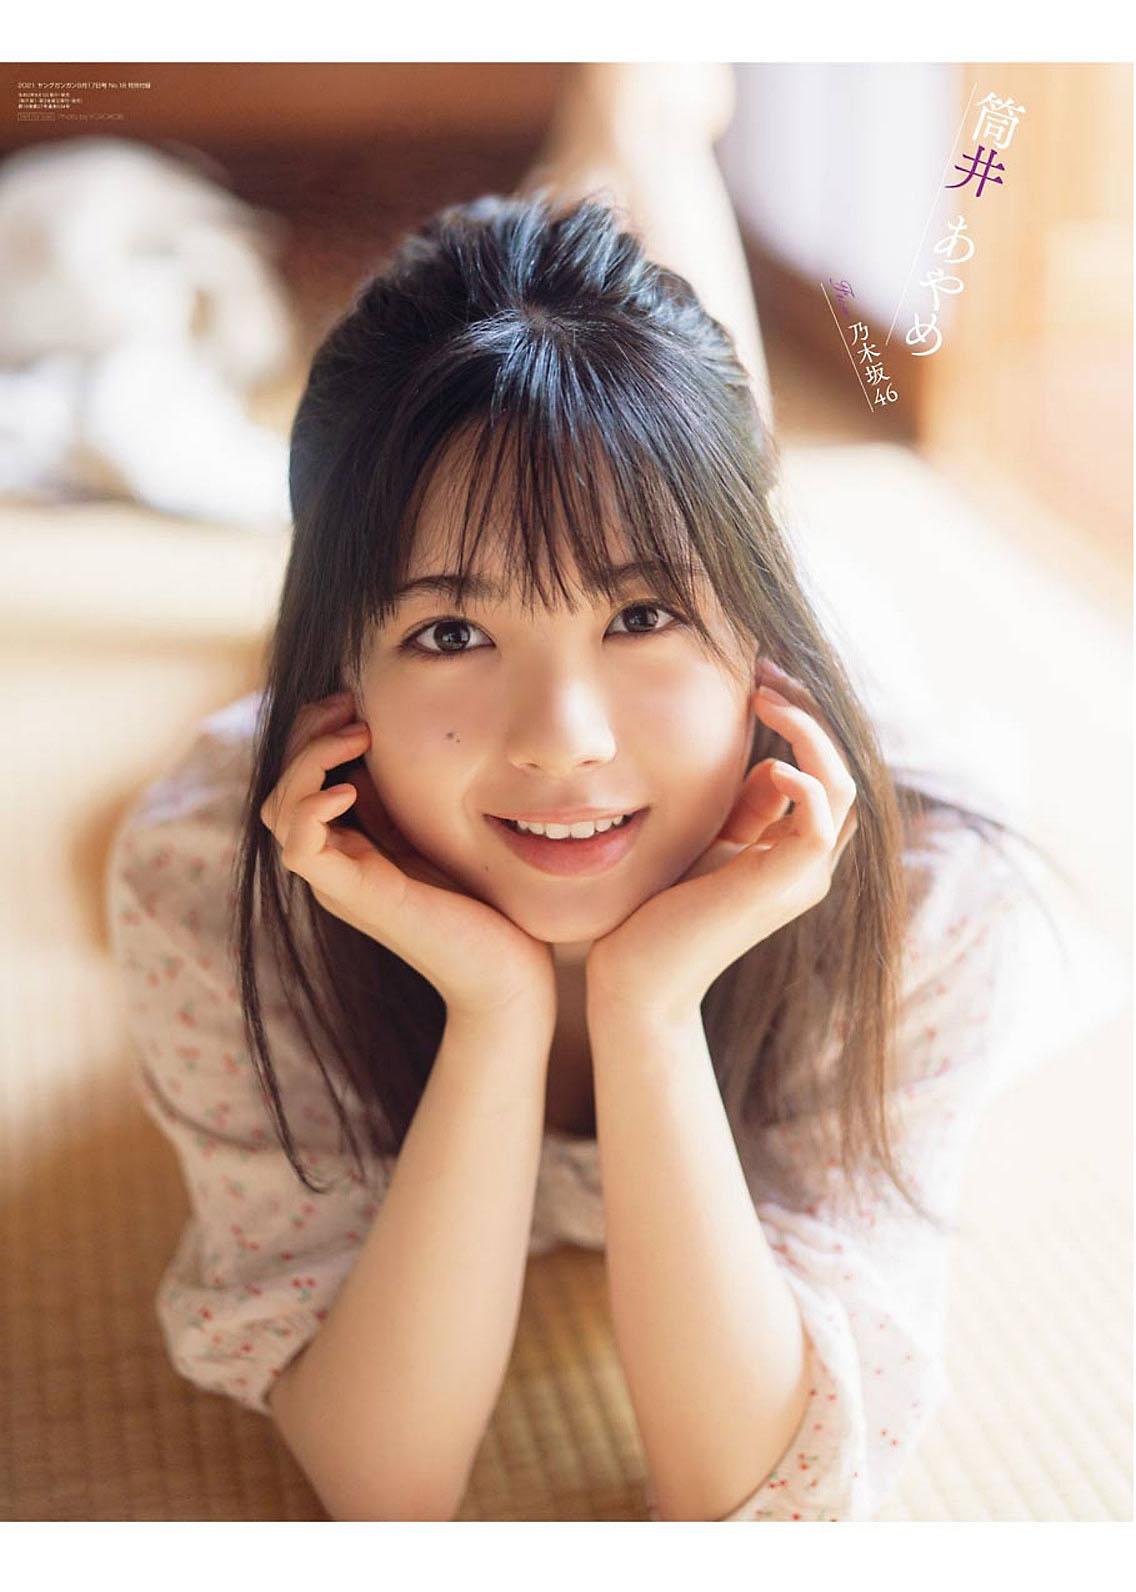 Tsutsue Auame Young Gangan 210917 12.jpg